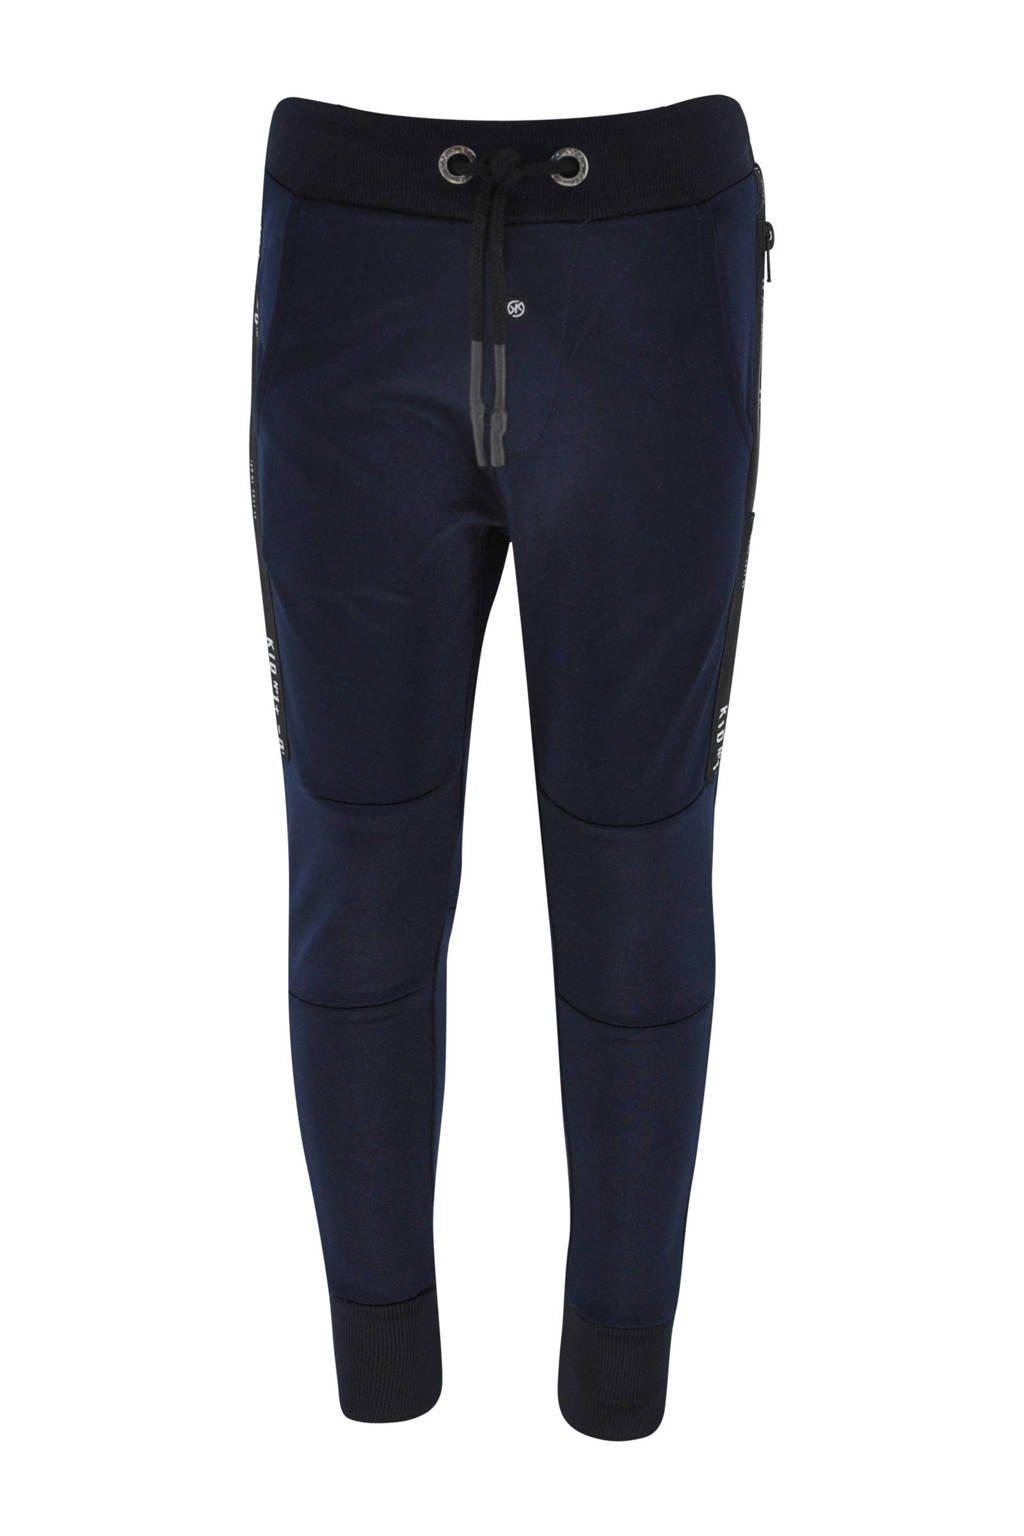 KIDDO broek Marc donkerblauw, Donkerblauw